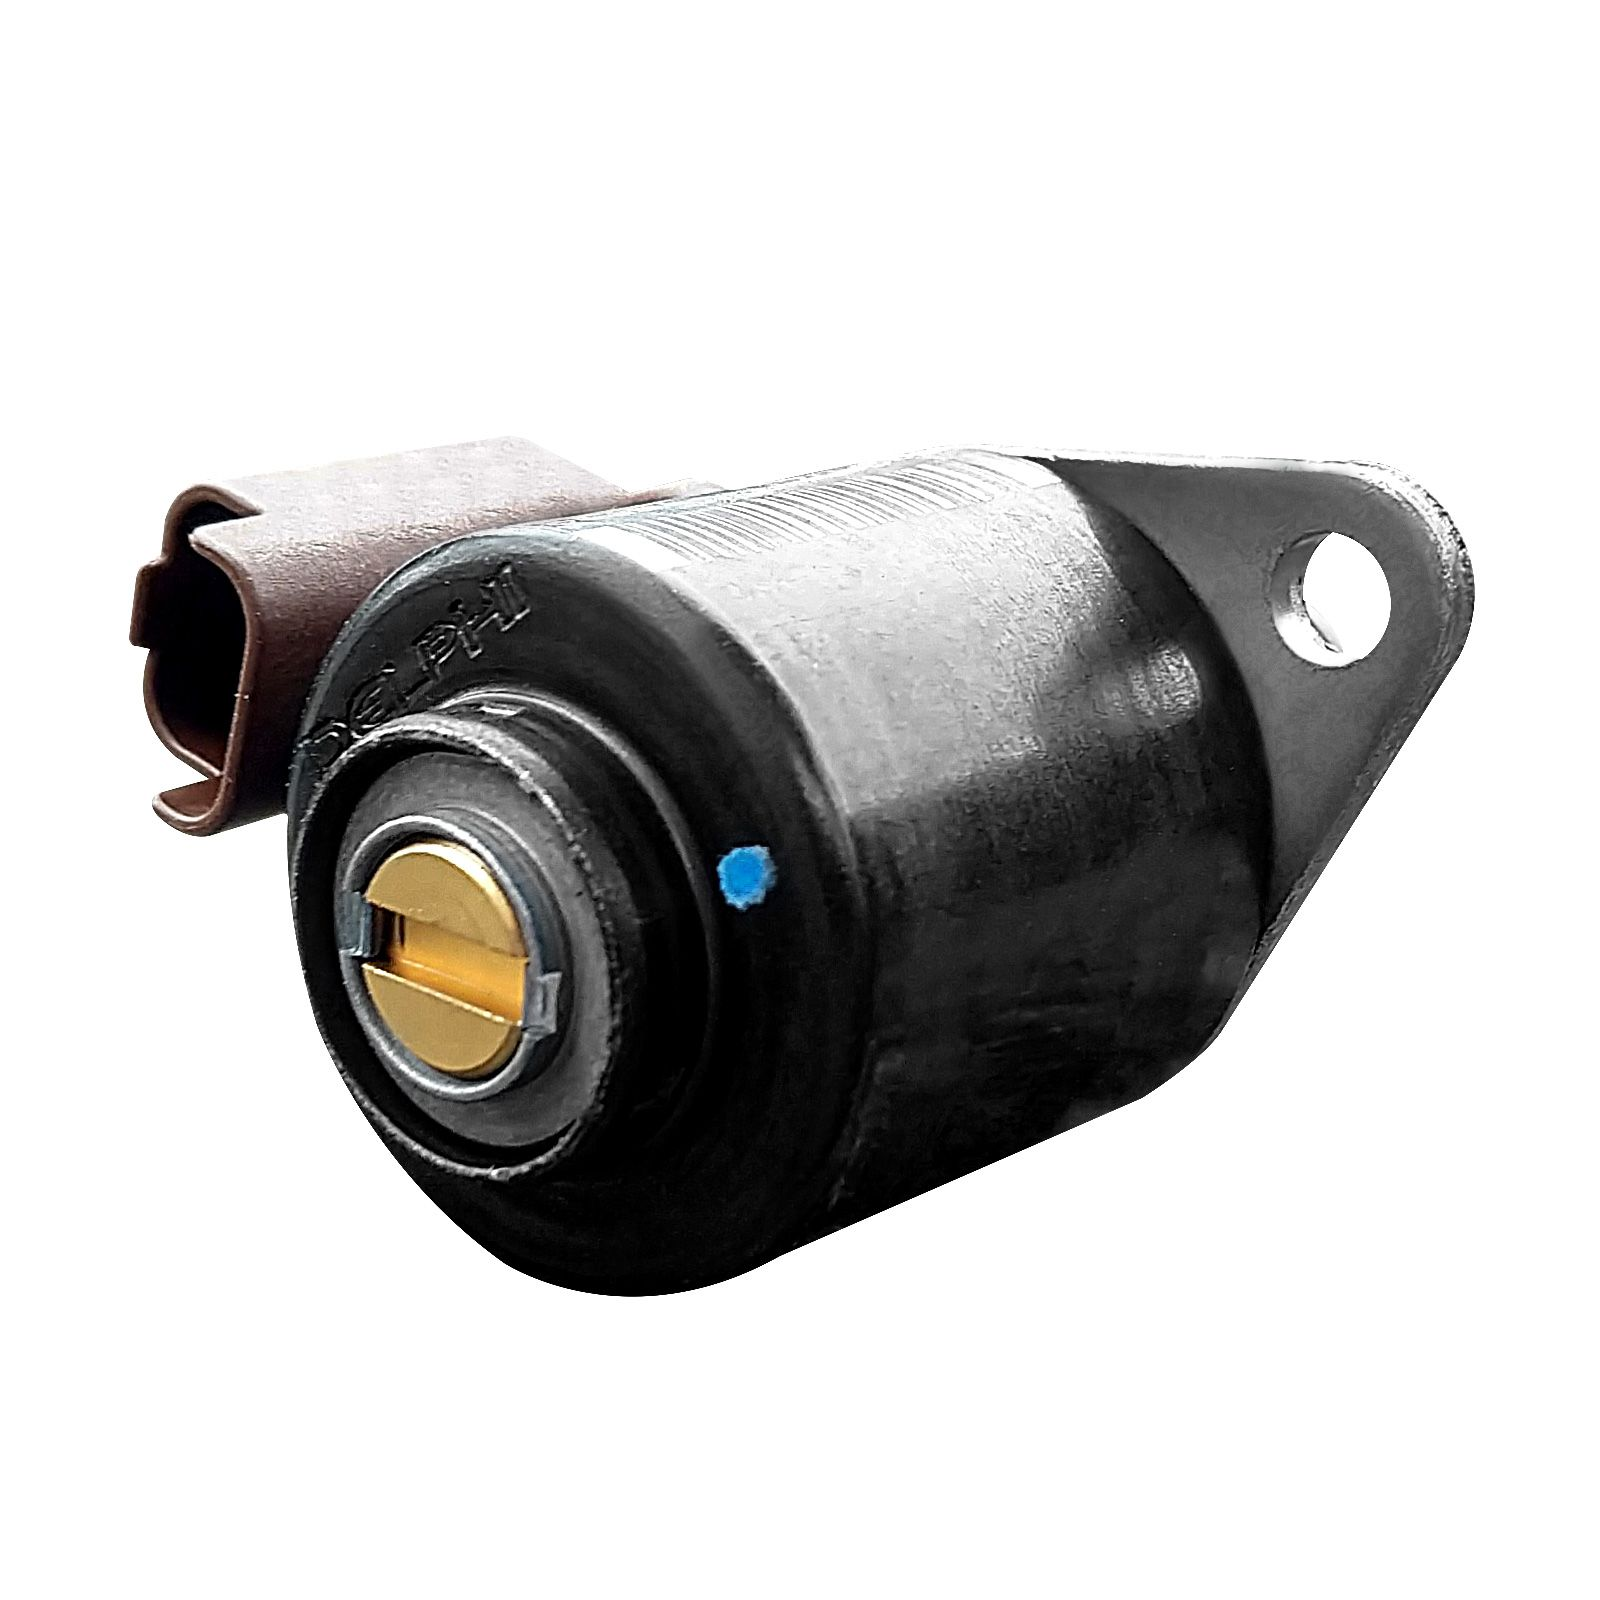 Válvula da Bomba de Alta Pressão Ssangyong Actyon 2.0 16v e kyron 2.7 20v